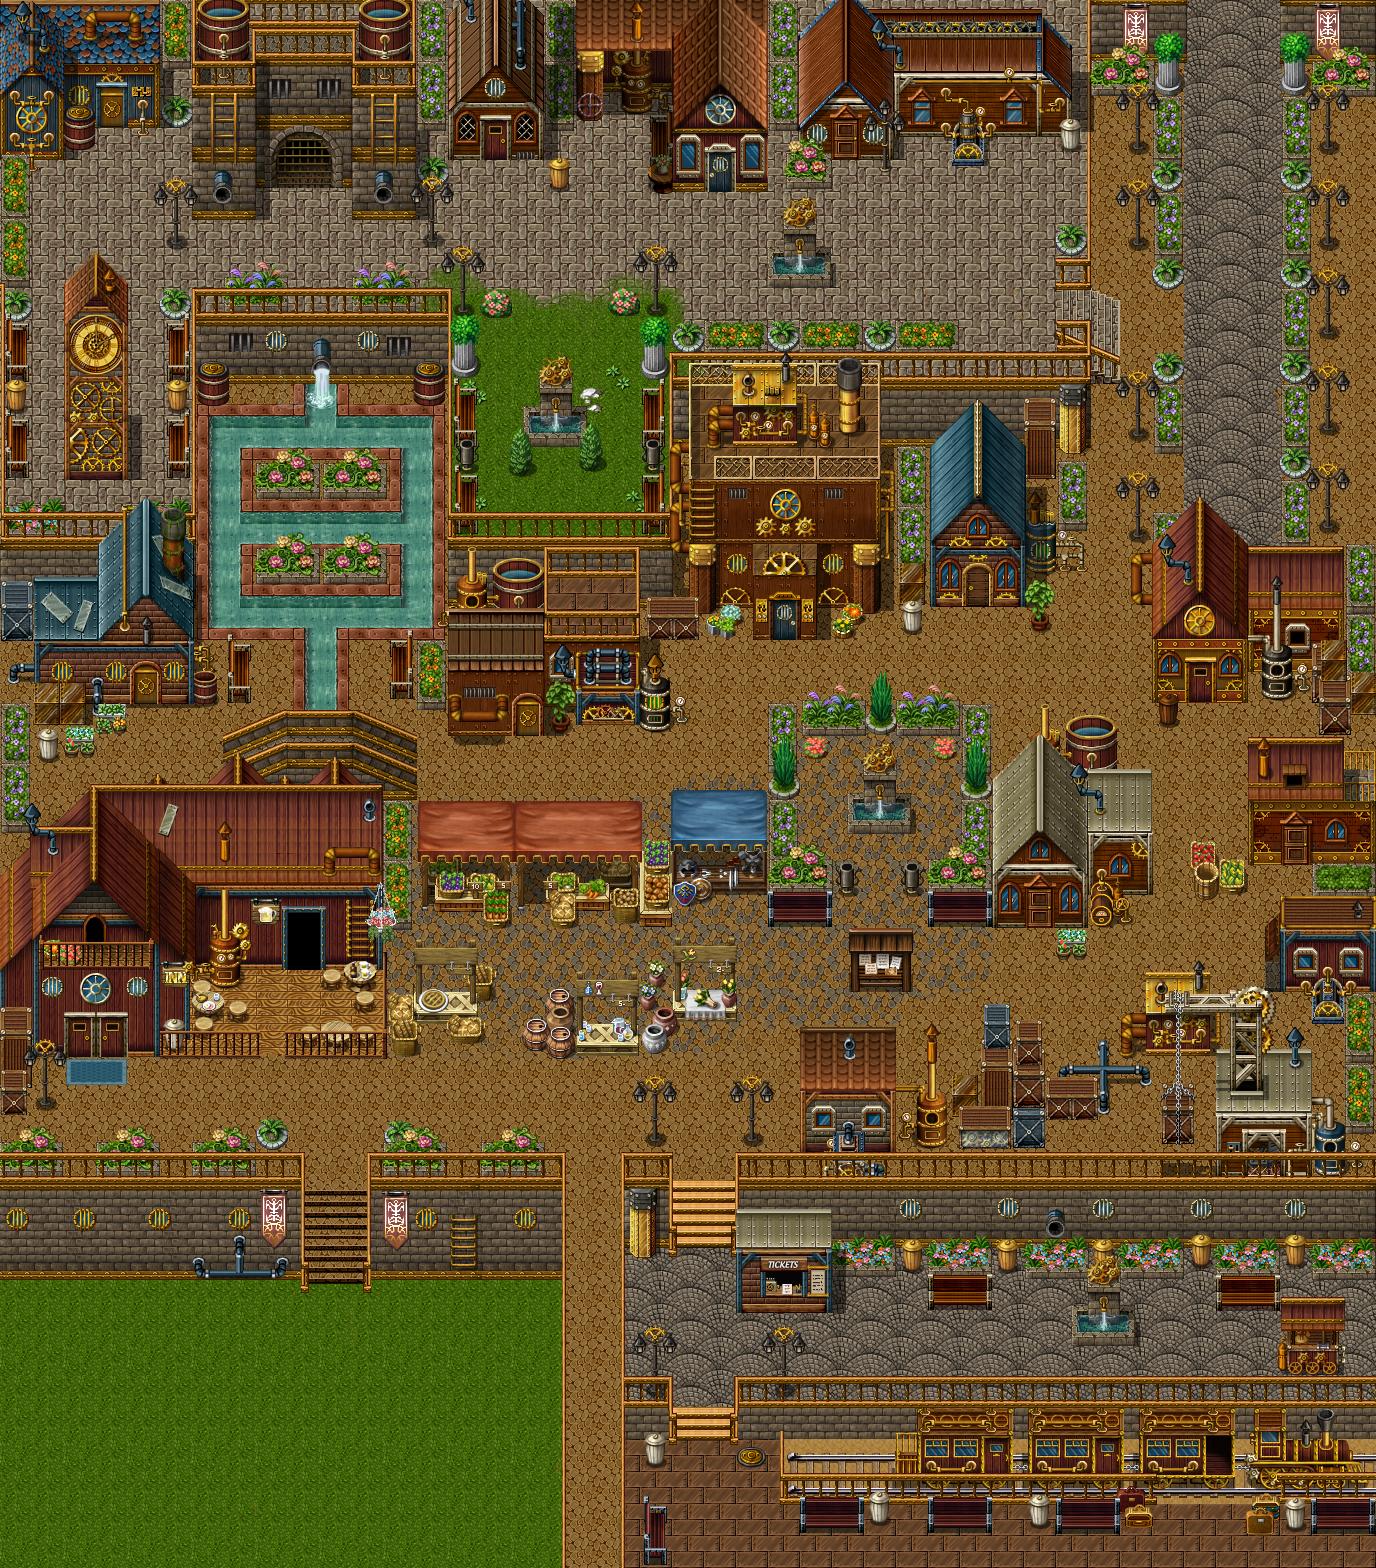 rj63eN.png | RPG Maker Maps | Pinterest | Rpg maker, RPG and Game art